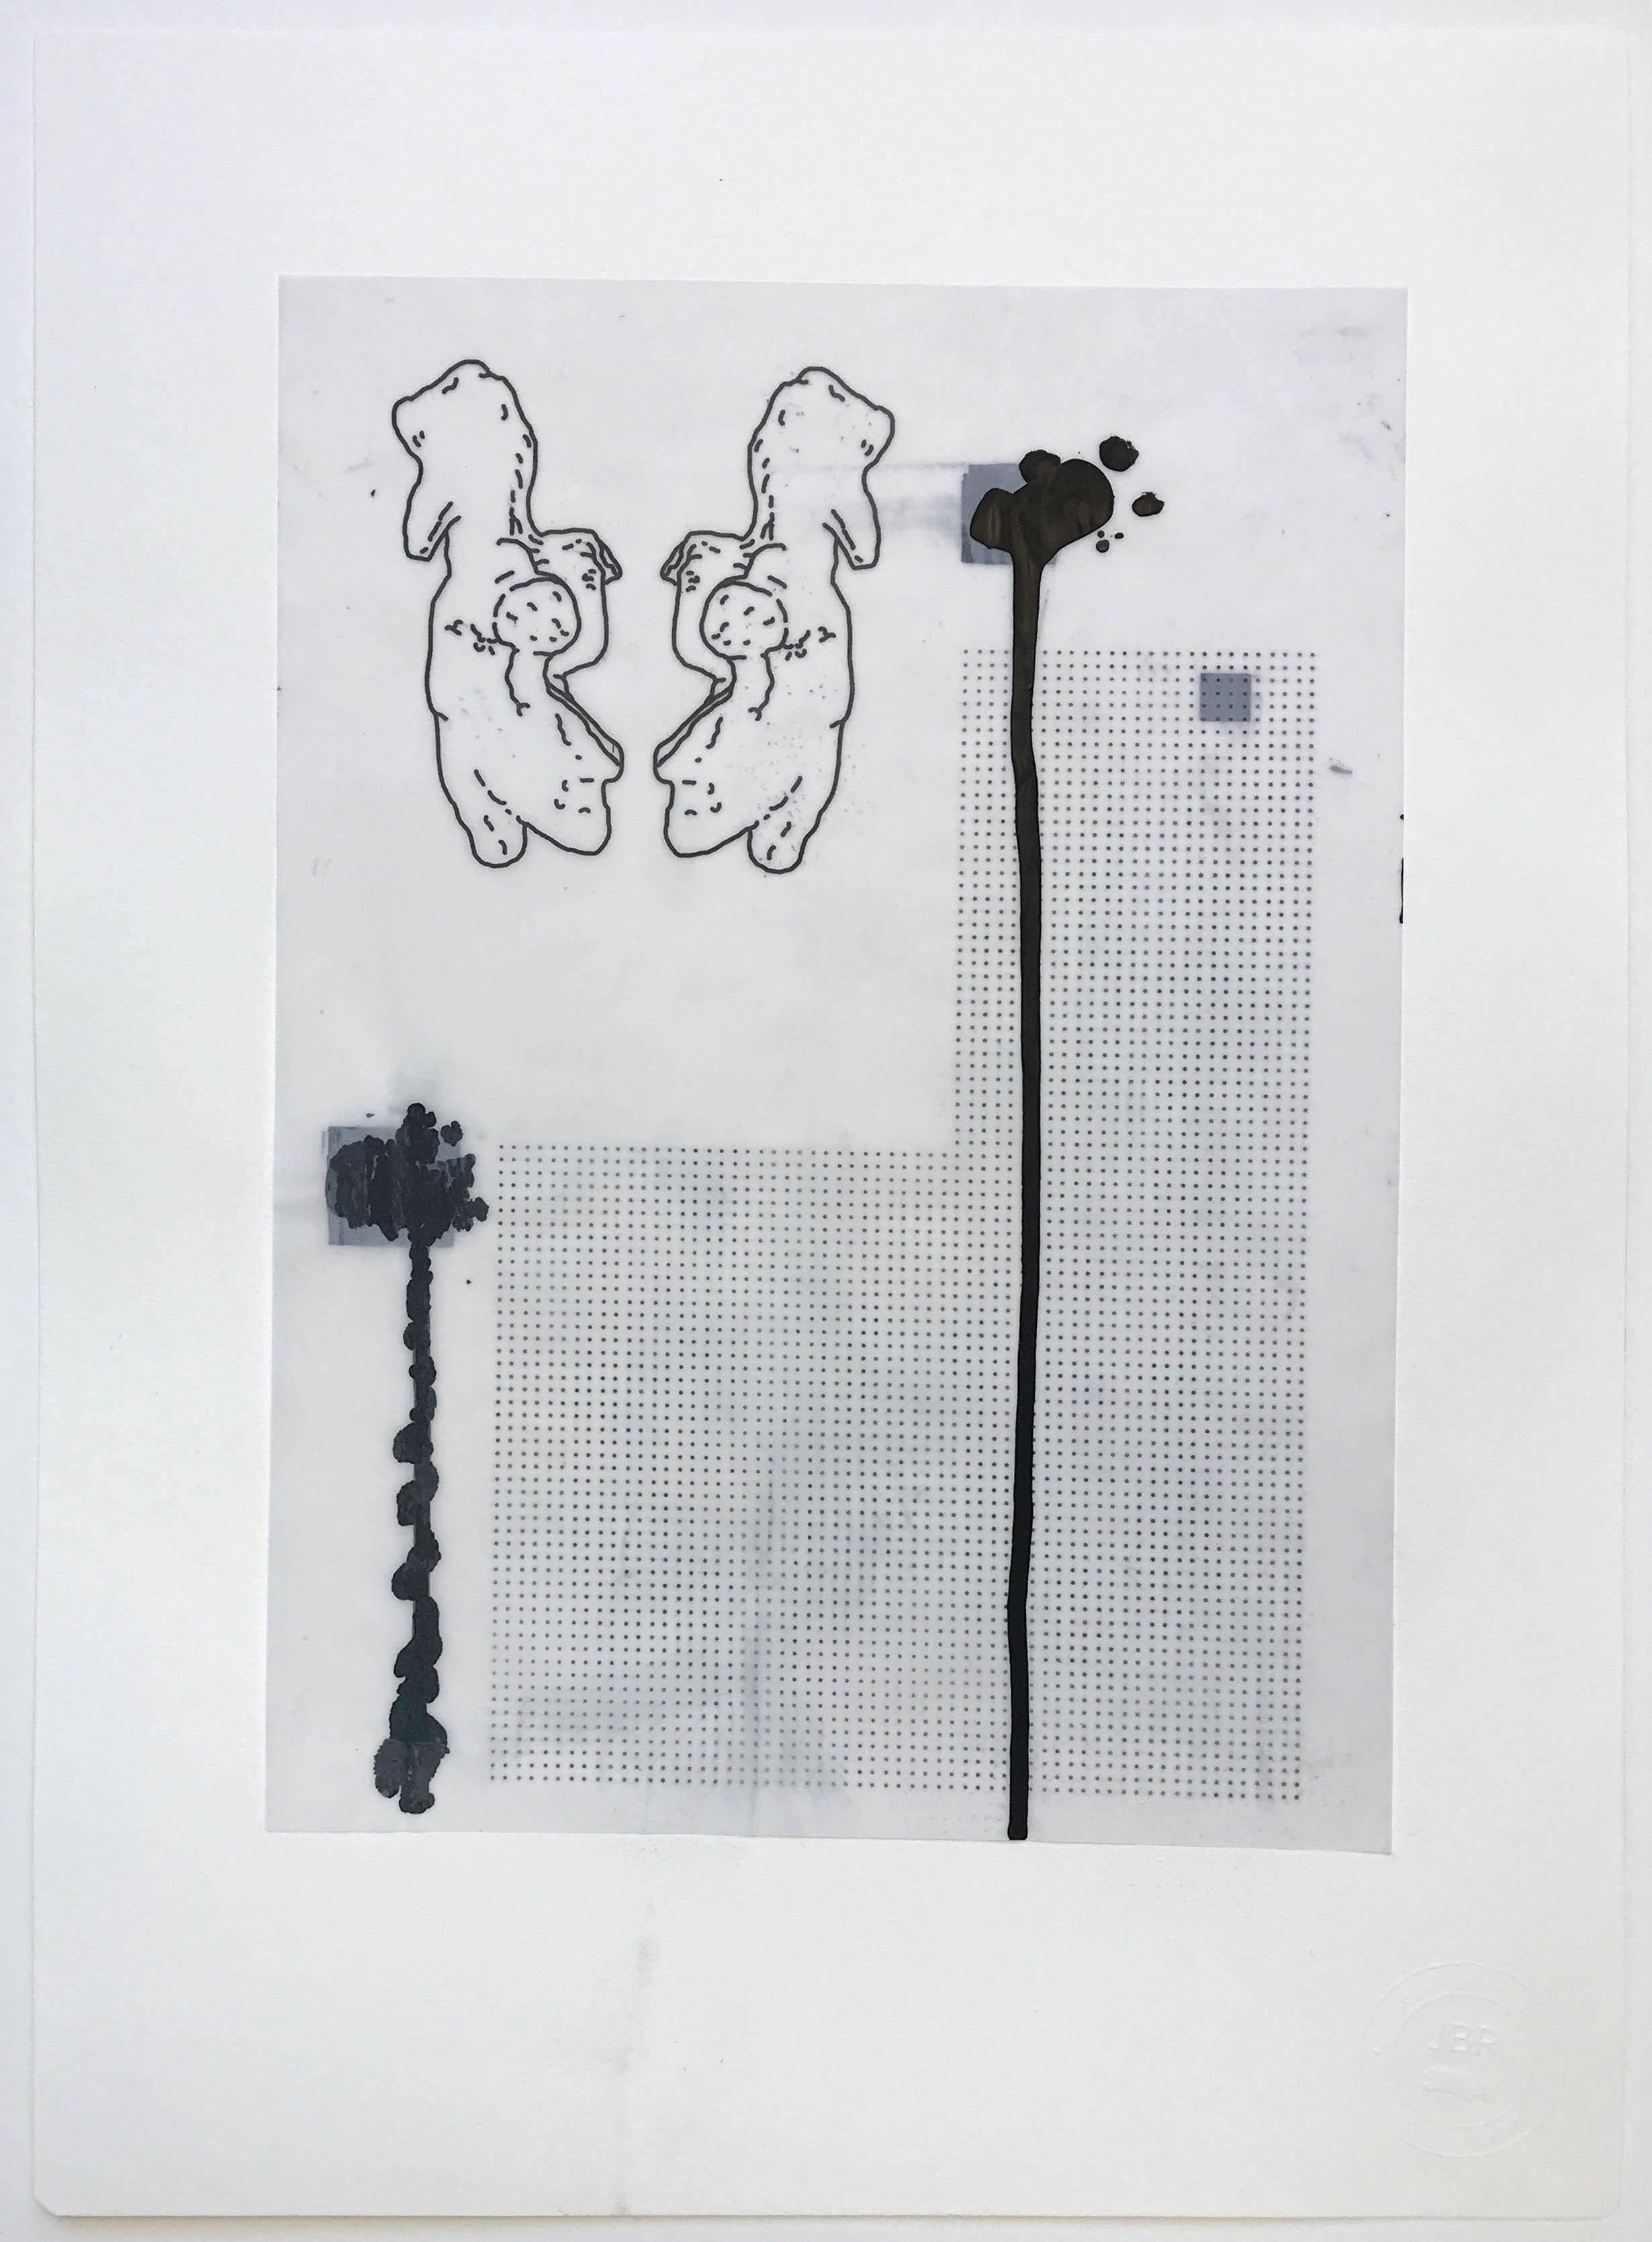 %22De regreso%22- Técnica mixta  - 42 x 30 cm - Julián Brangold - 2018.jpg